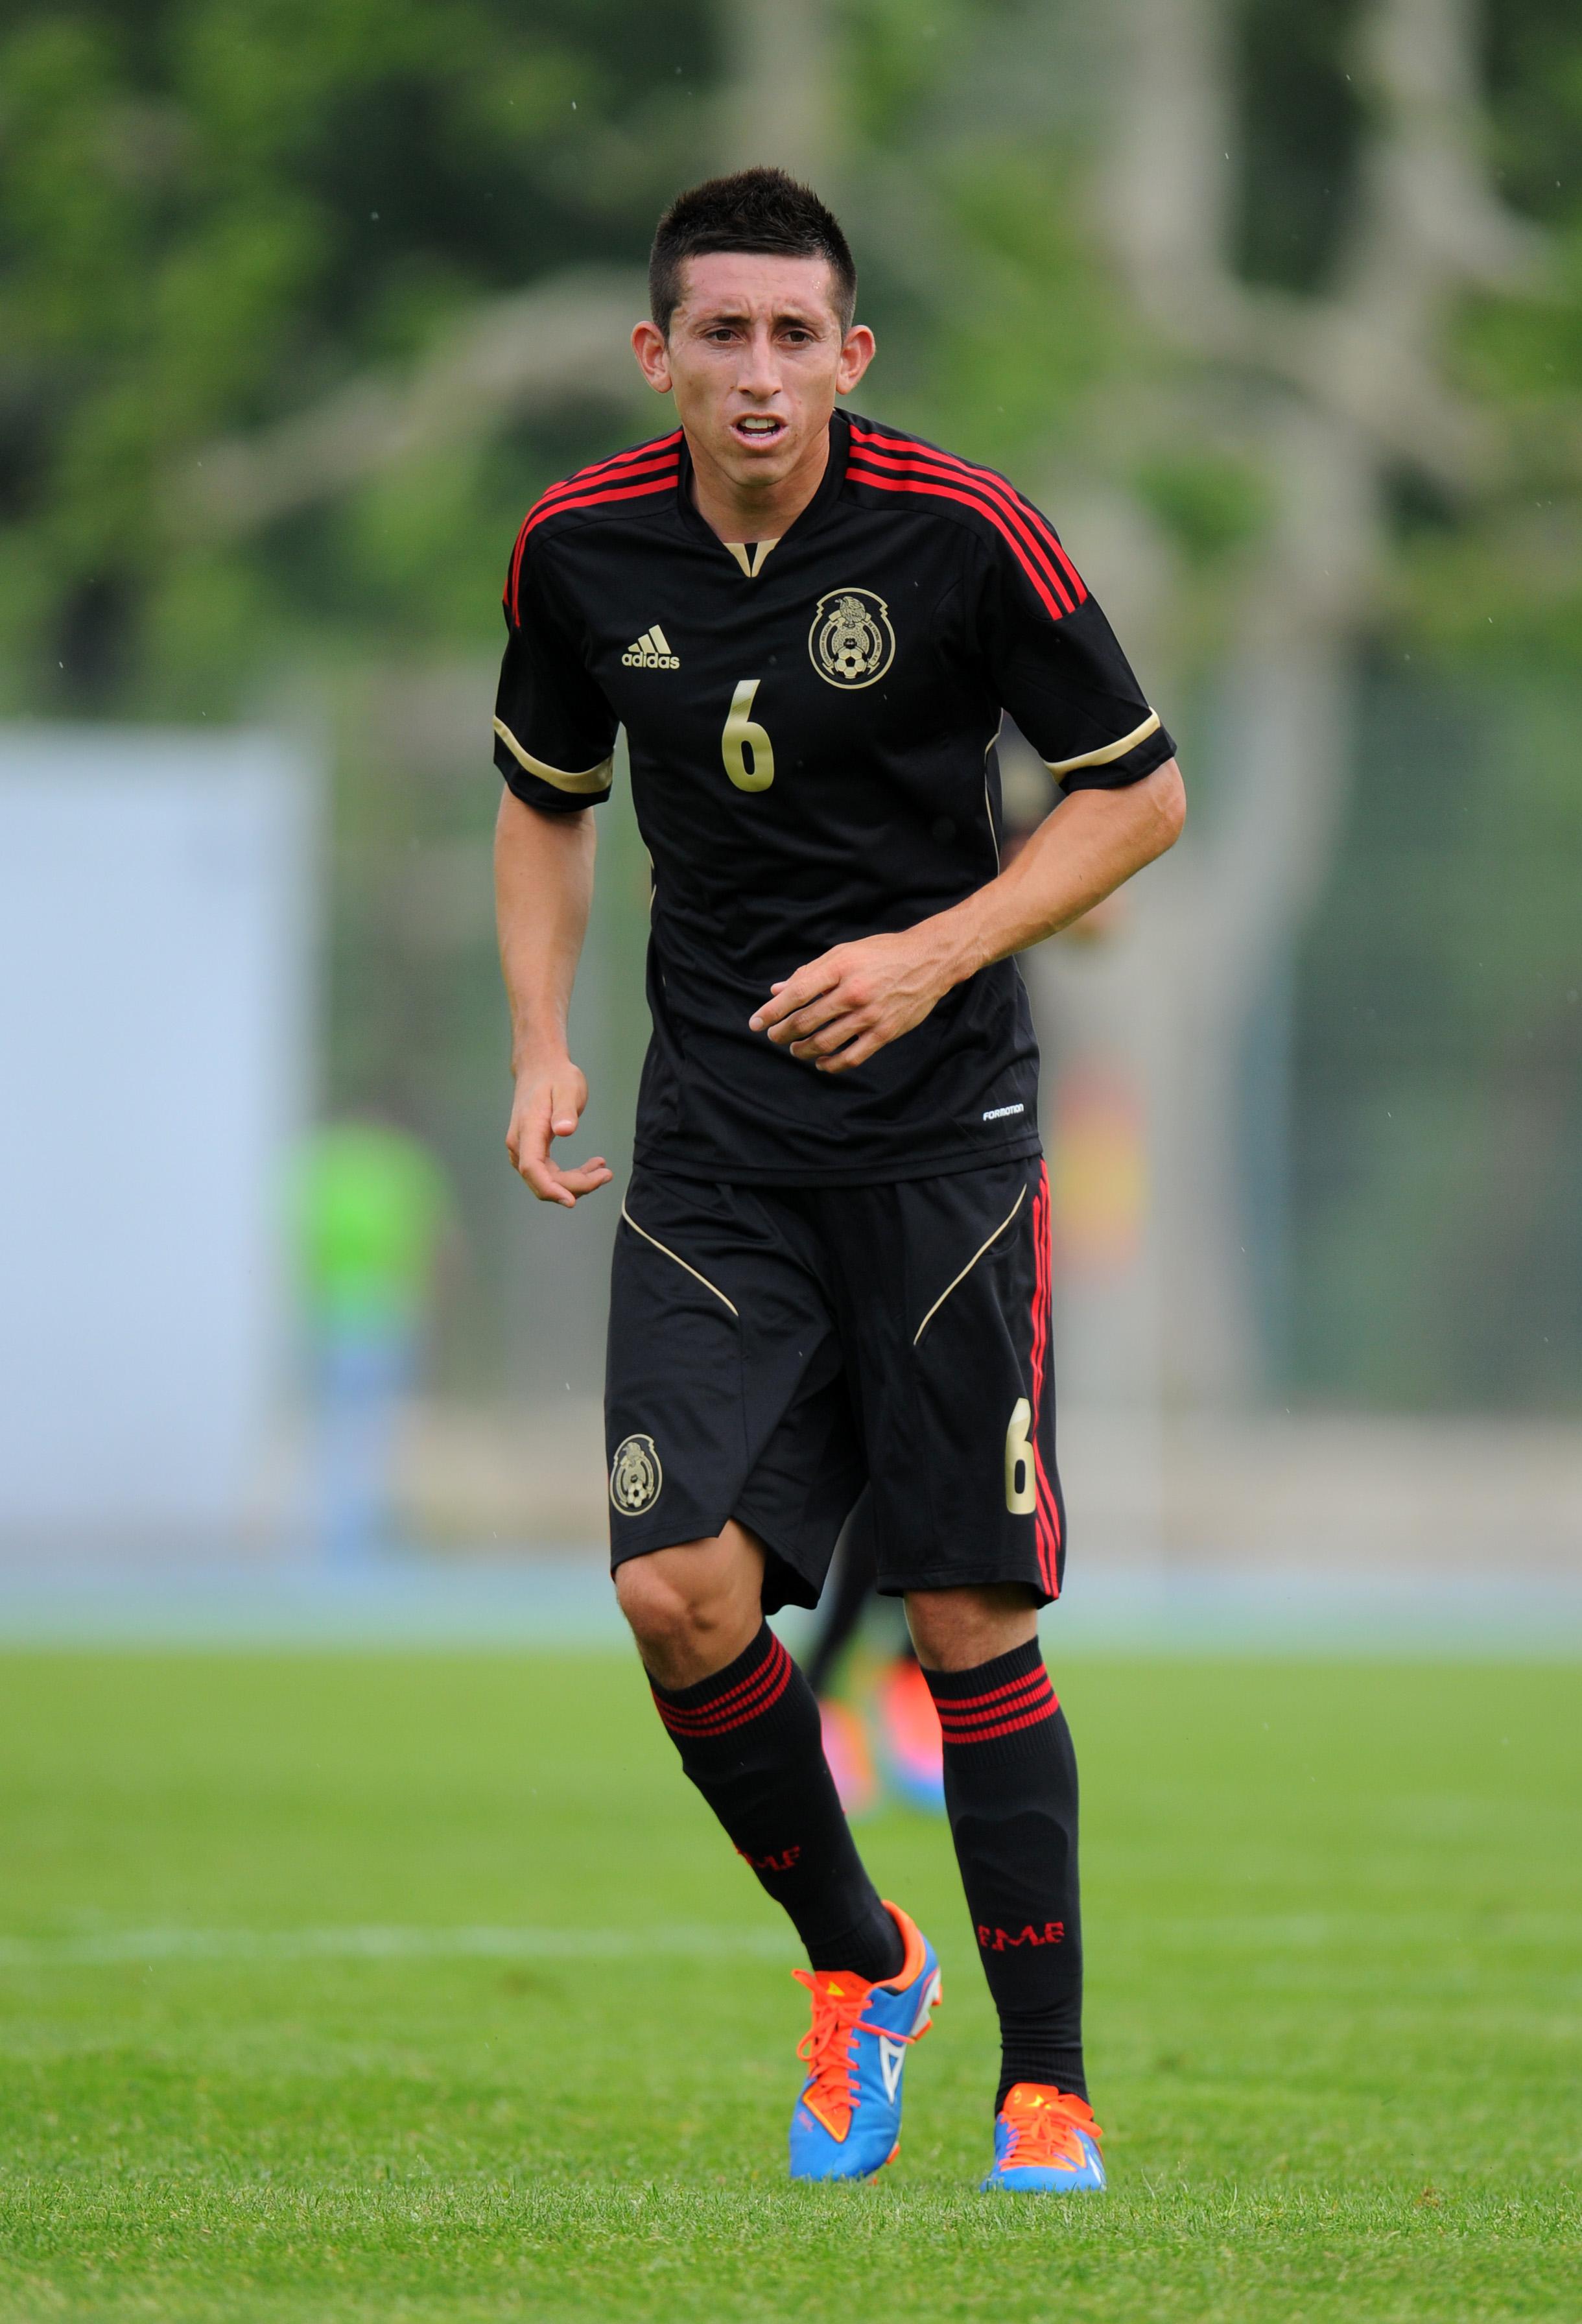 Soccer - 2012 Toulon Tournament - Group B - Mexico v Morocco